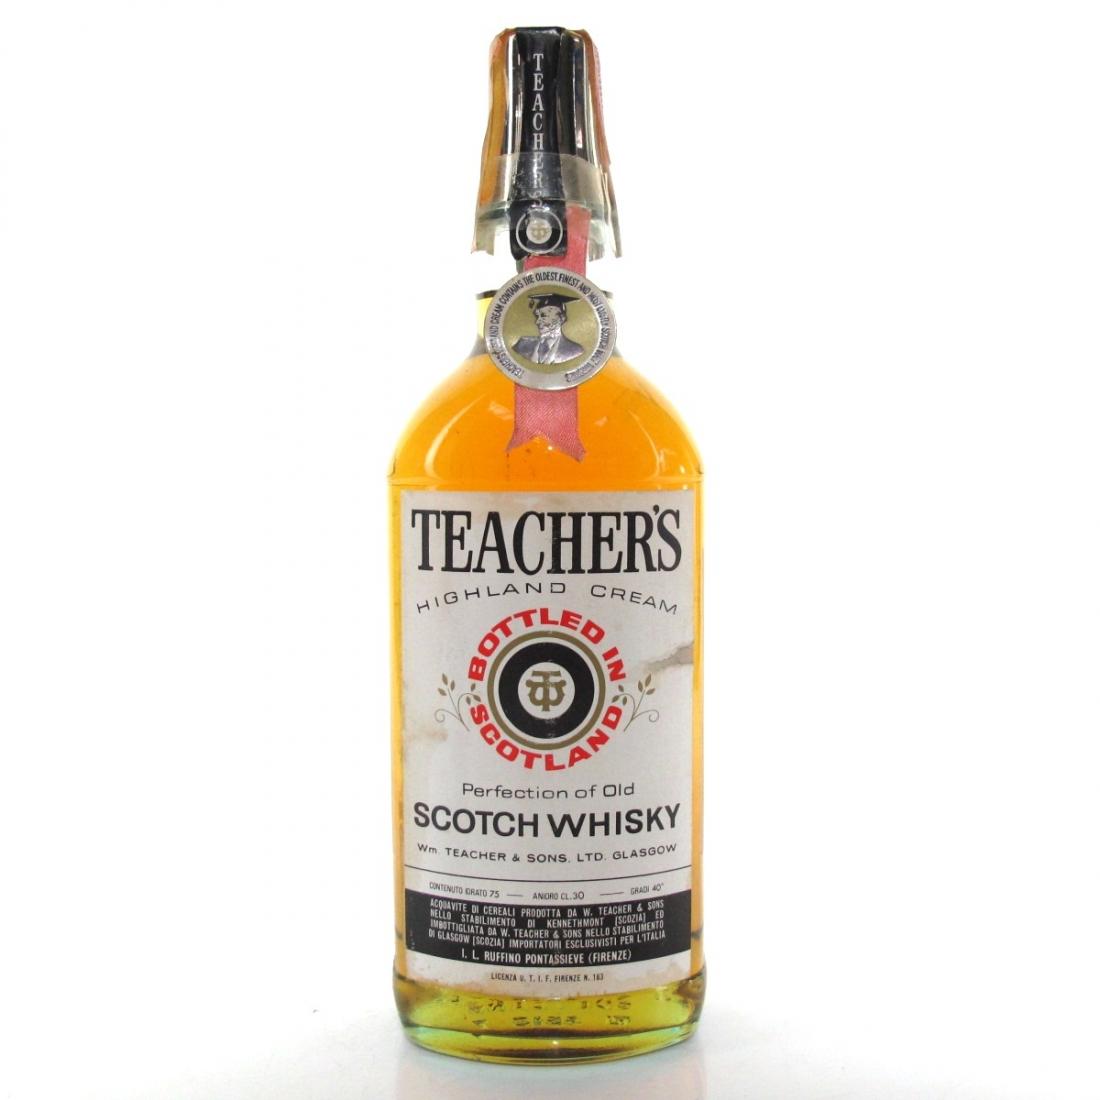 Teacher's Highland Cream 1960s / Ruffino Import